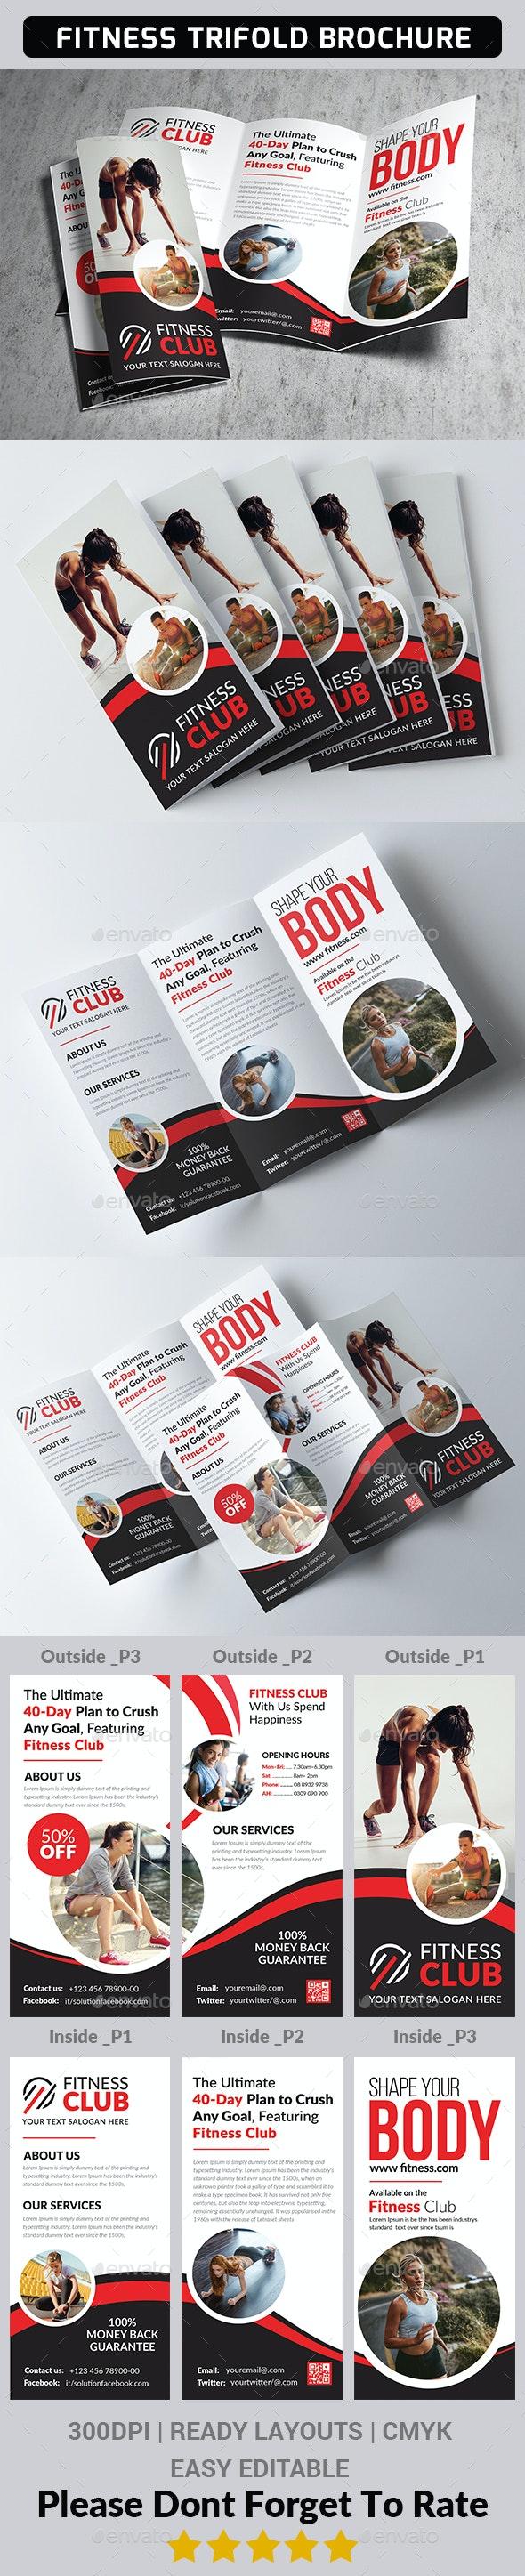 Fitness Tri Fold Brochure - Corporate Brochures